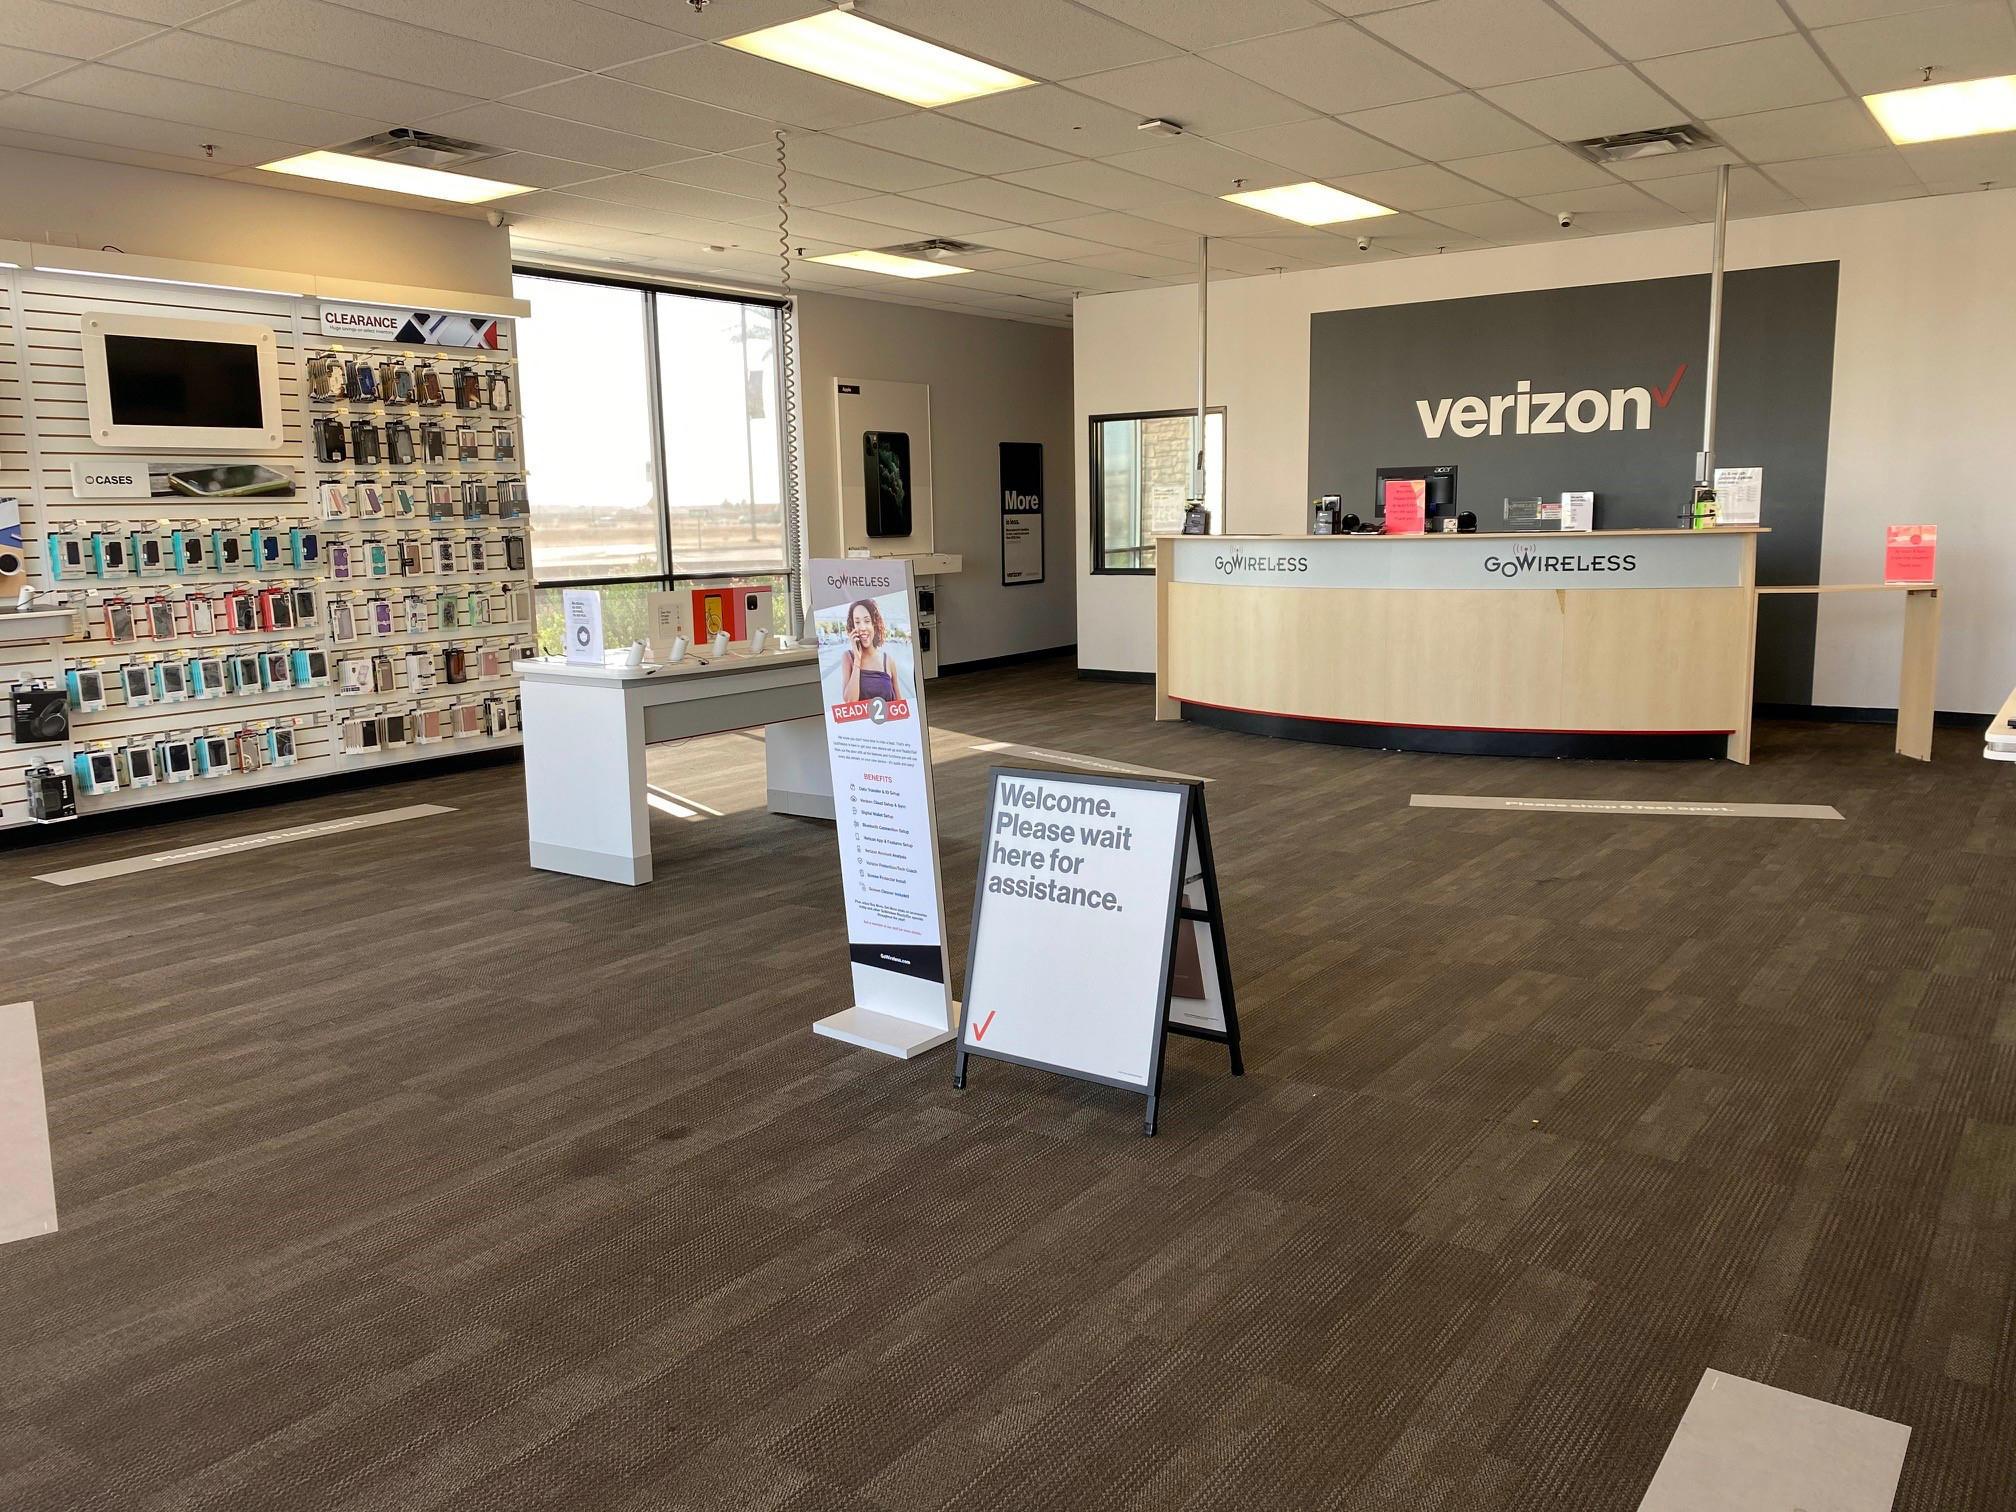 Verizon Authorized Retailer - GoWireless